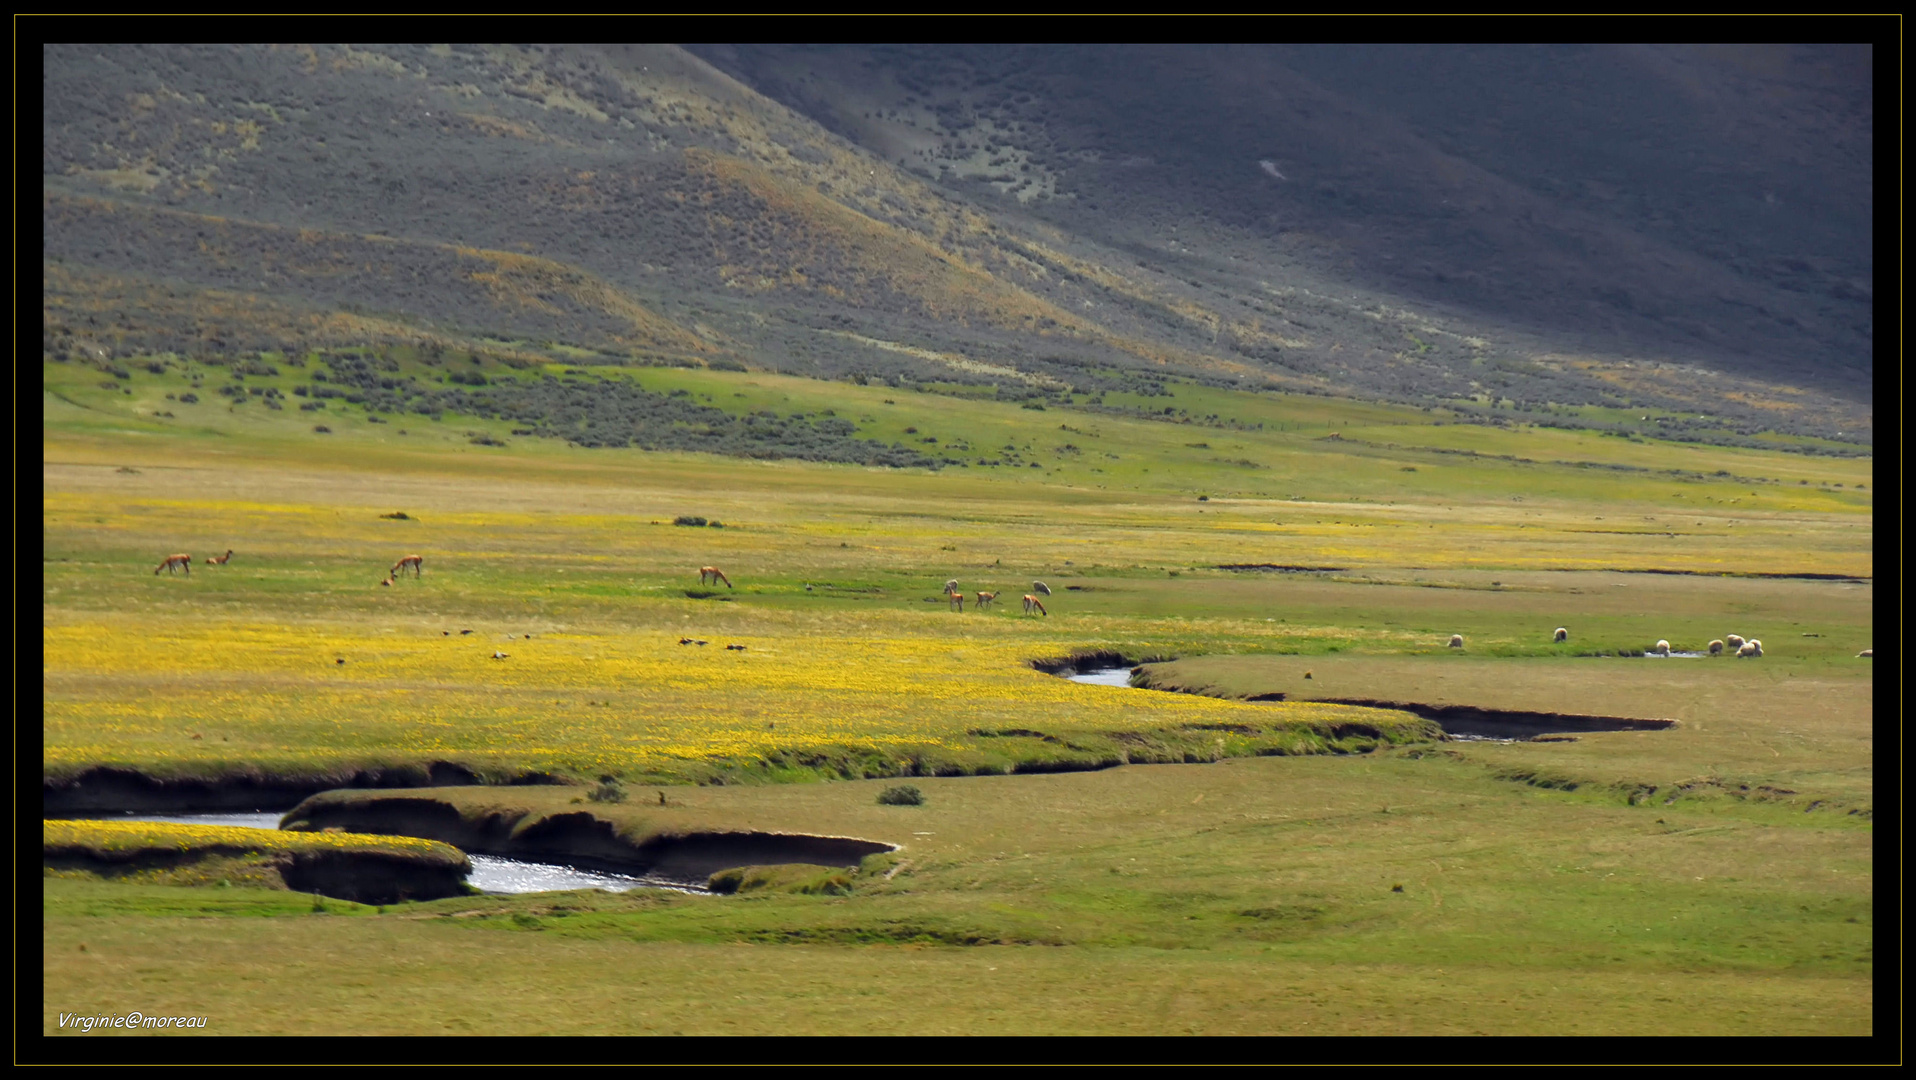 Springtime in Patagonia